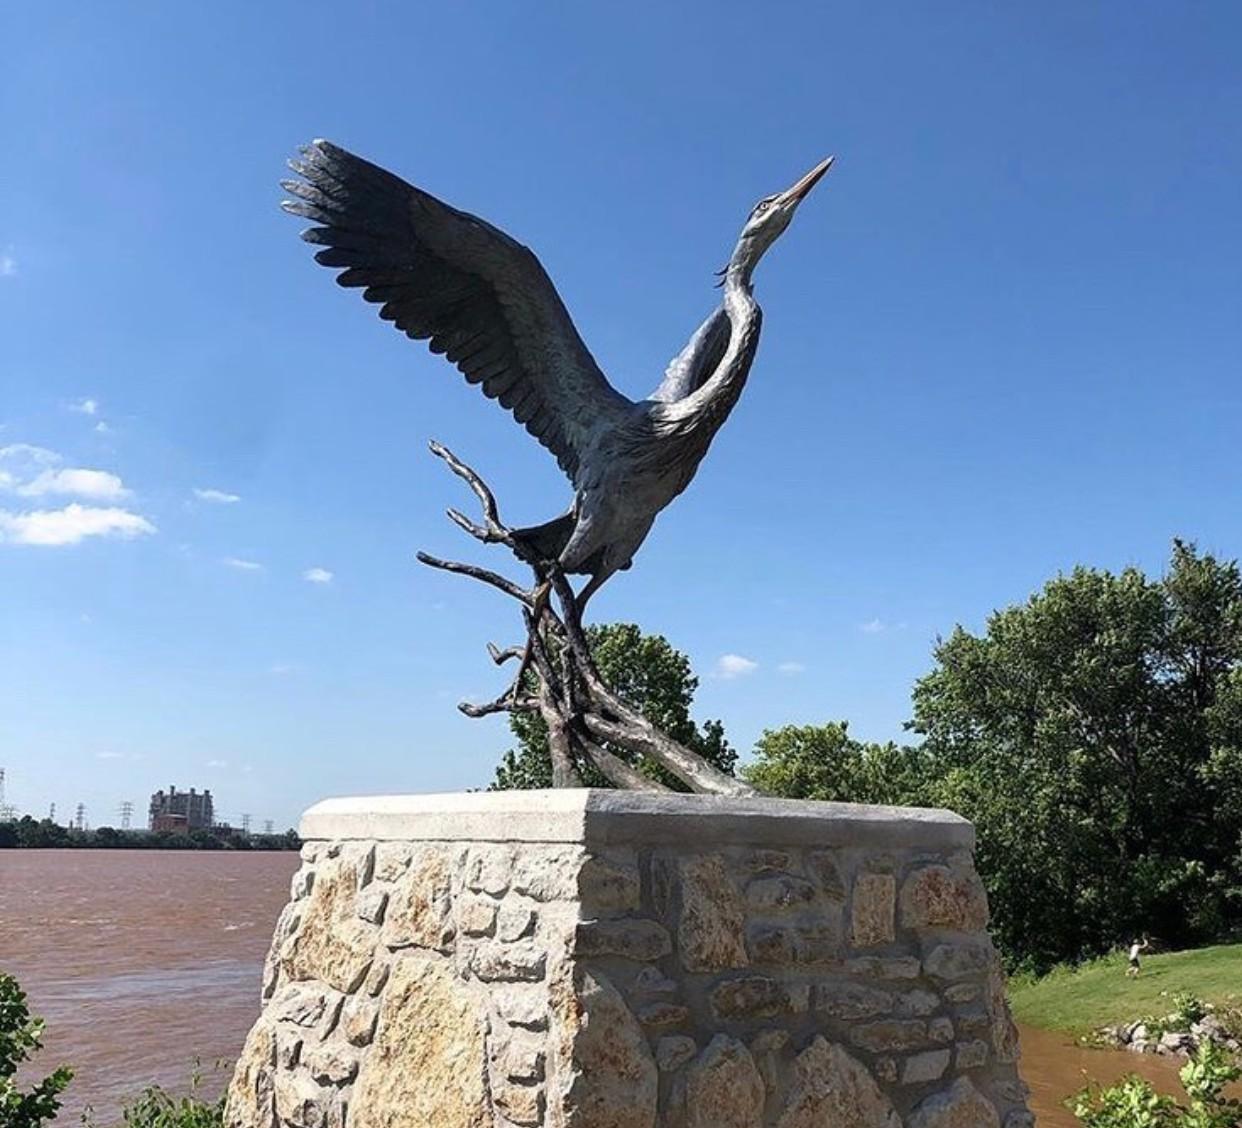 Bird statues figurines